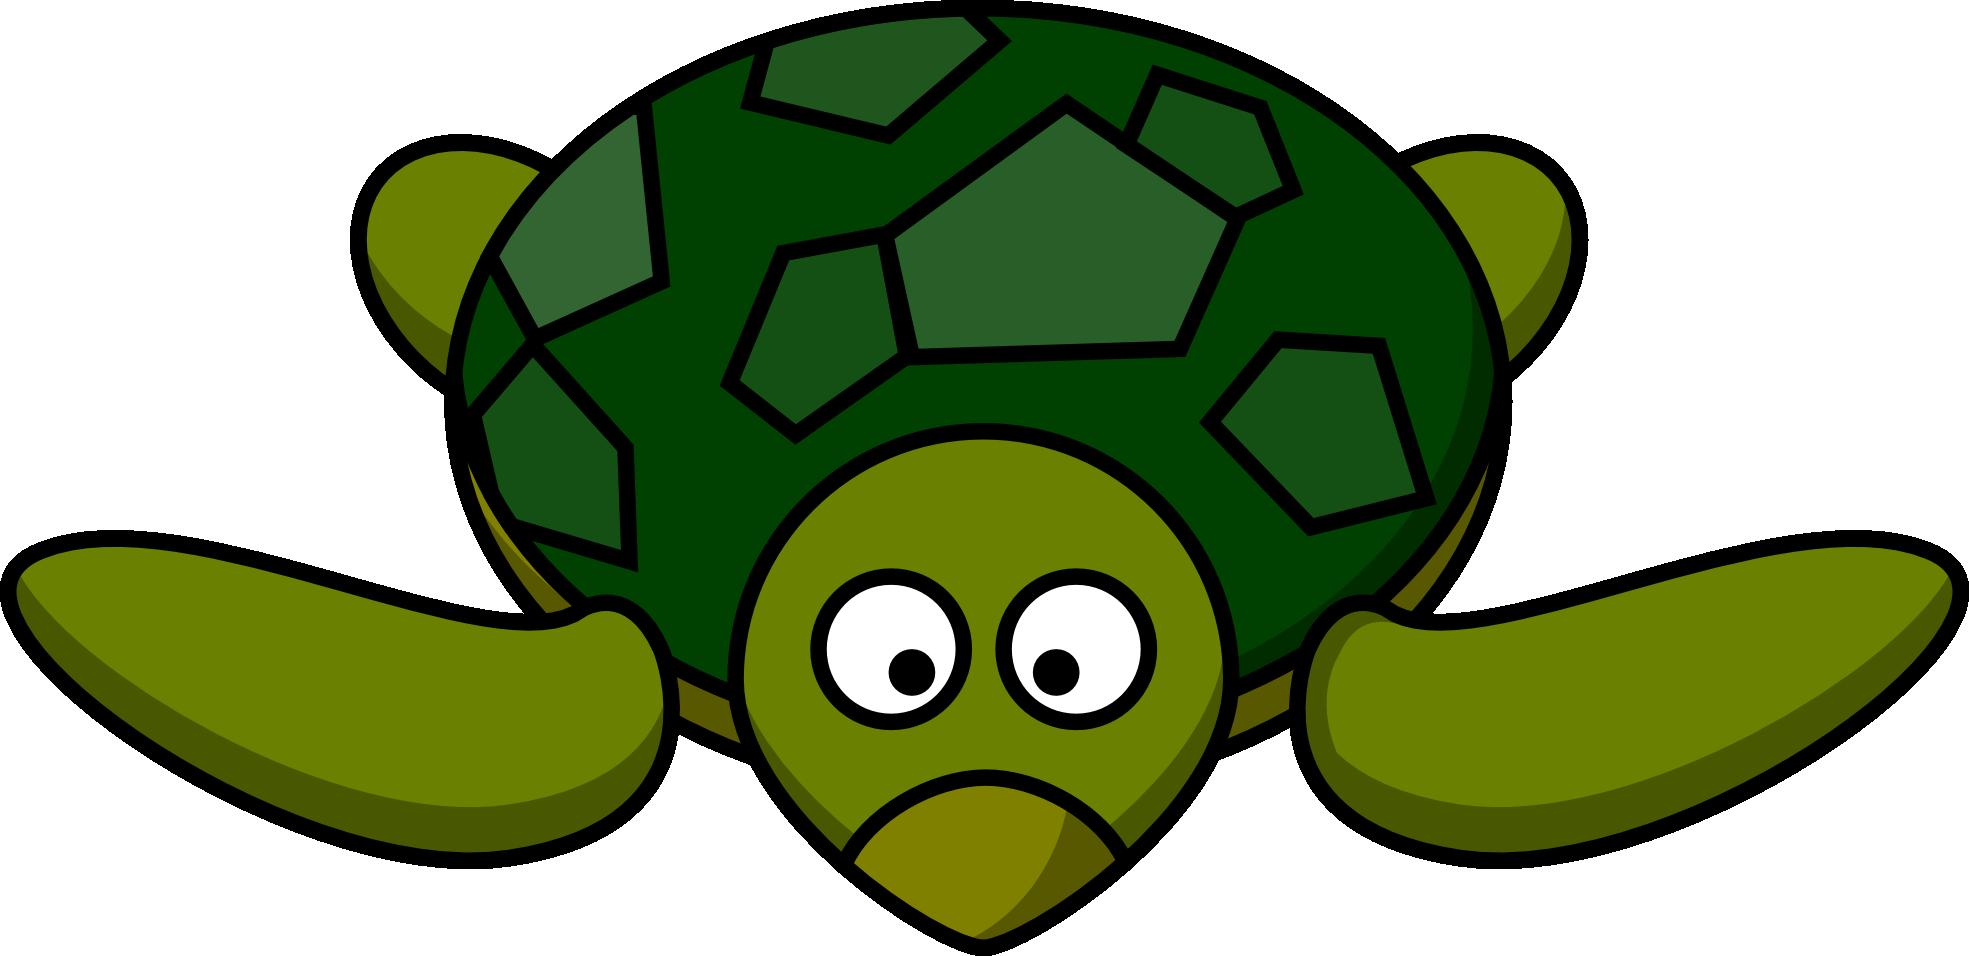 Cartoon Turtle Picture - ClipArt Best